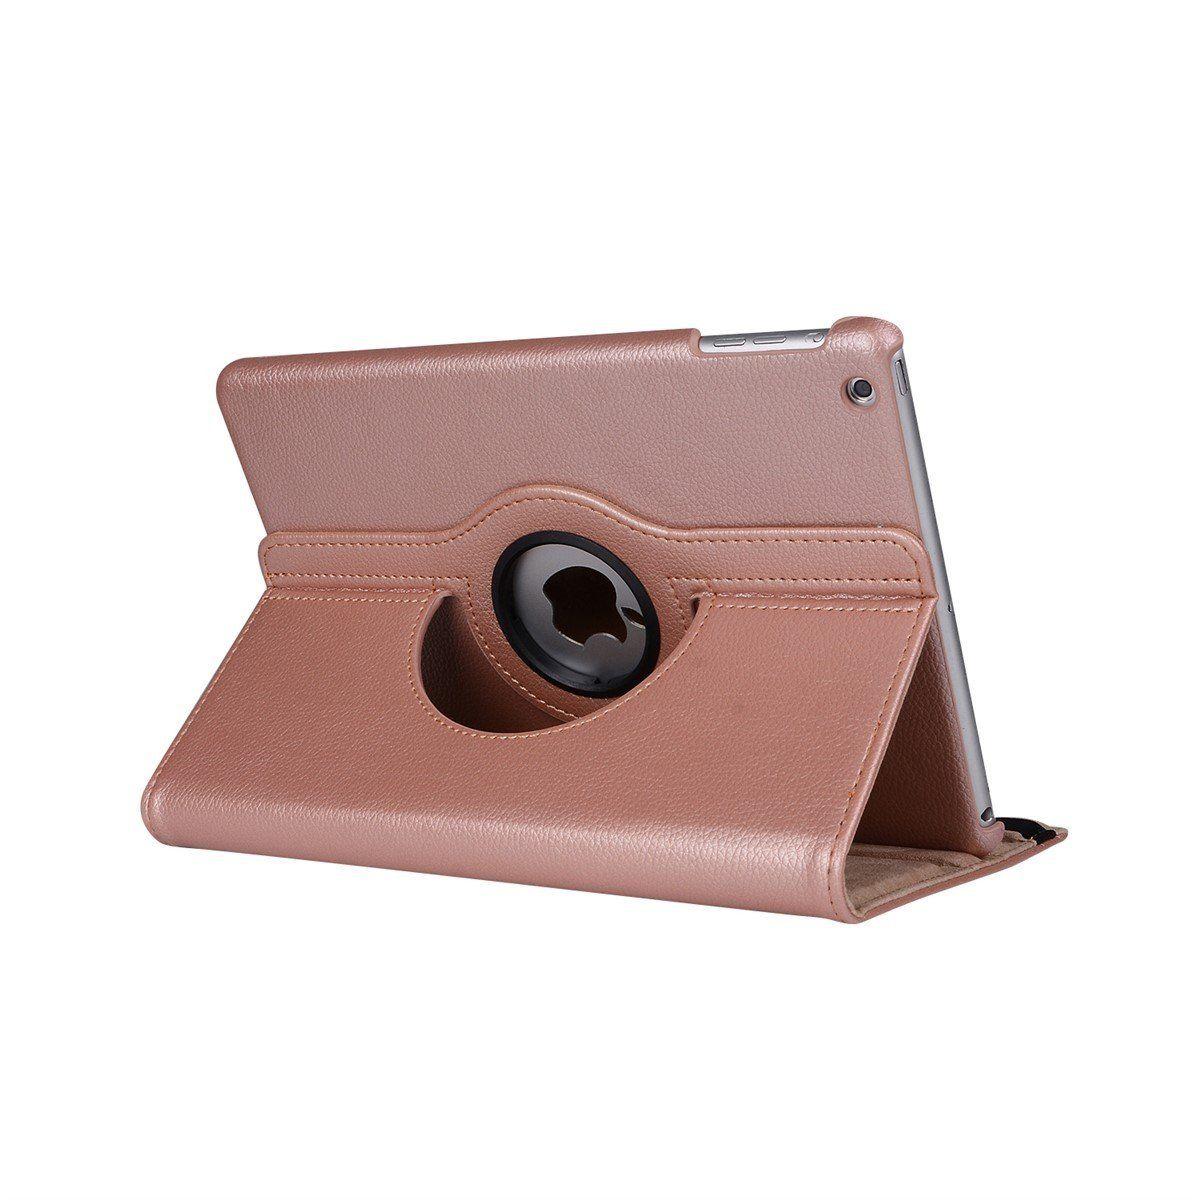 Custodia per Apple IPAD 2 iPad 3 iPad4, inShang Cover case in pelle PU: Amazon.it: Elettronica